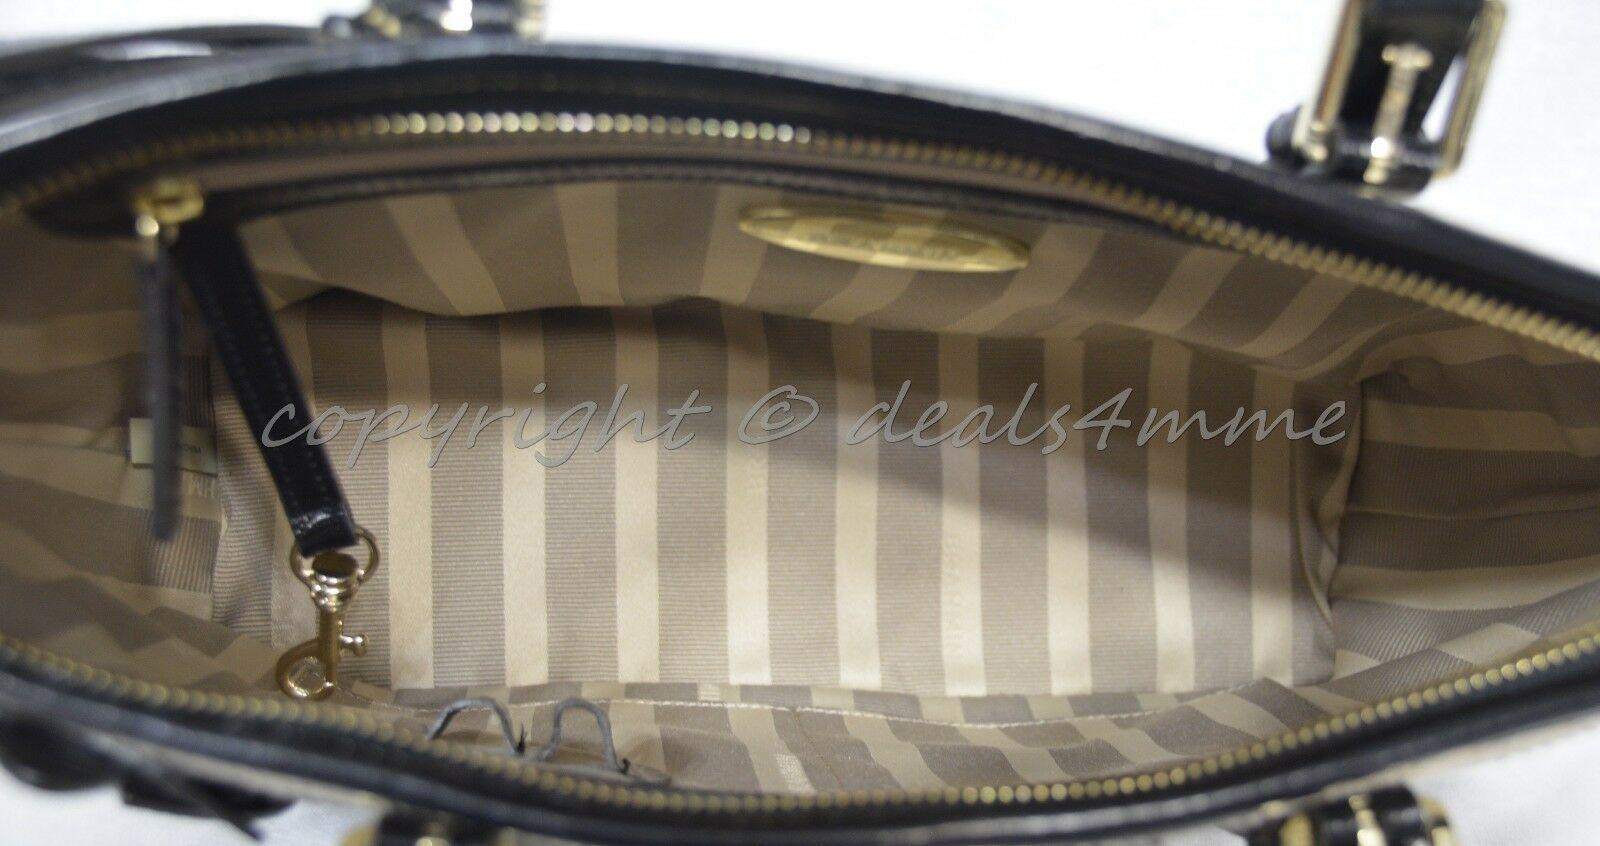 NWT Brahmin Mini Asher Satchel/Shoulder Bag in Black Miramonte-Cream with Black image 6